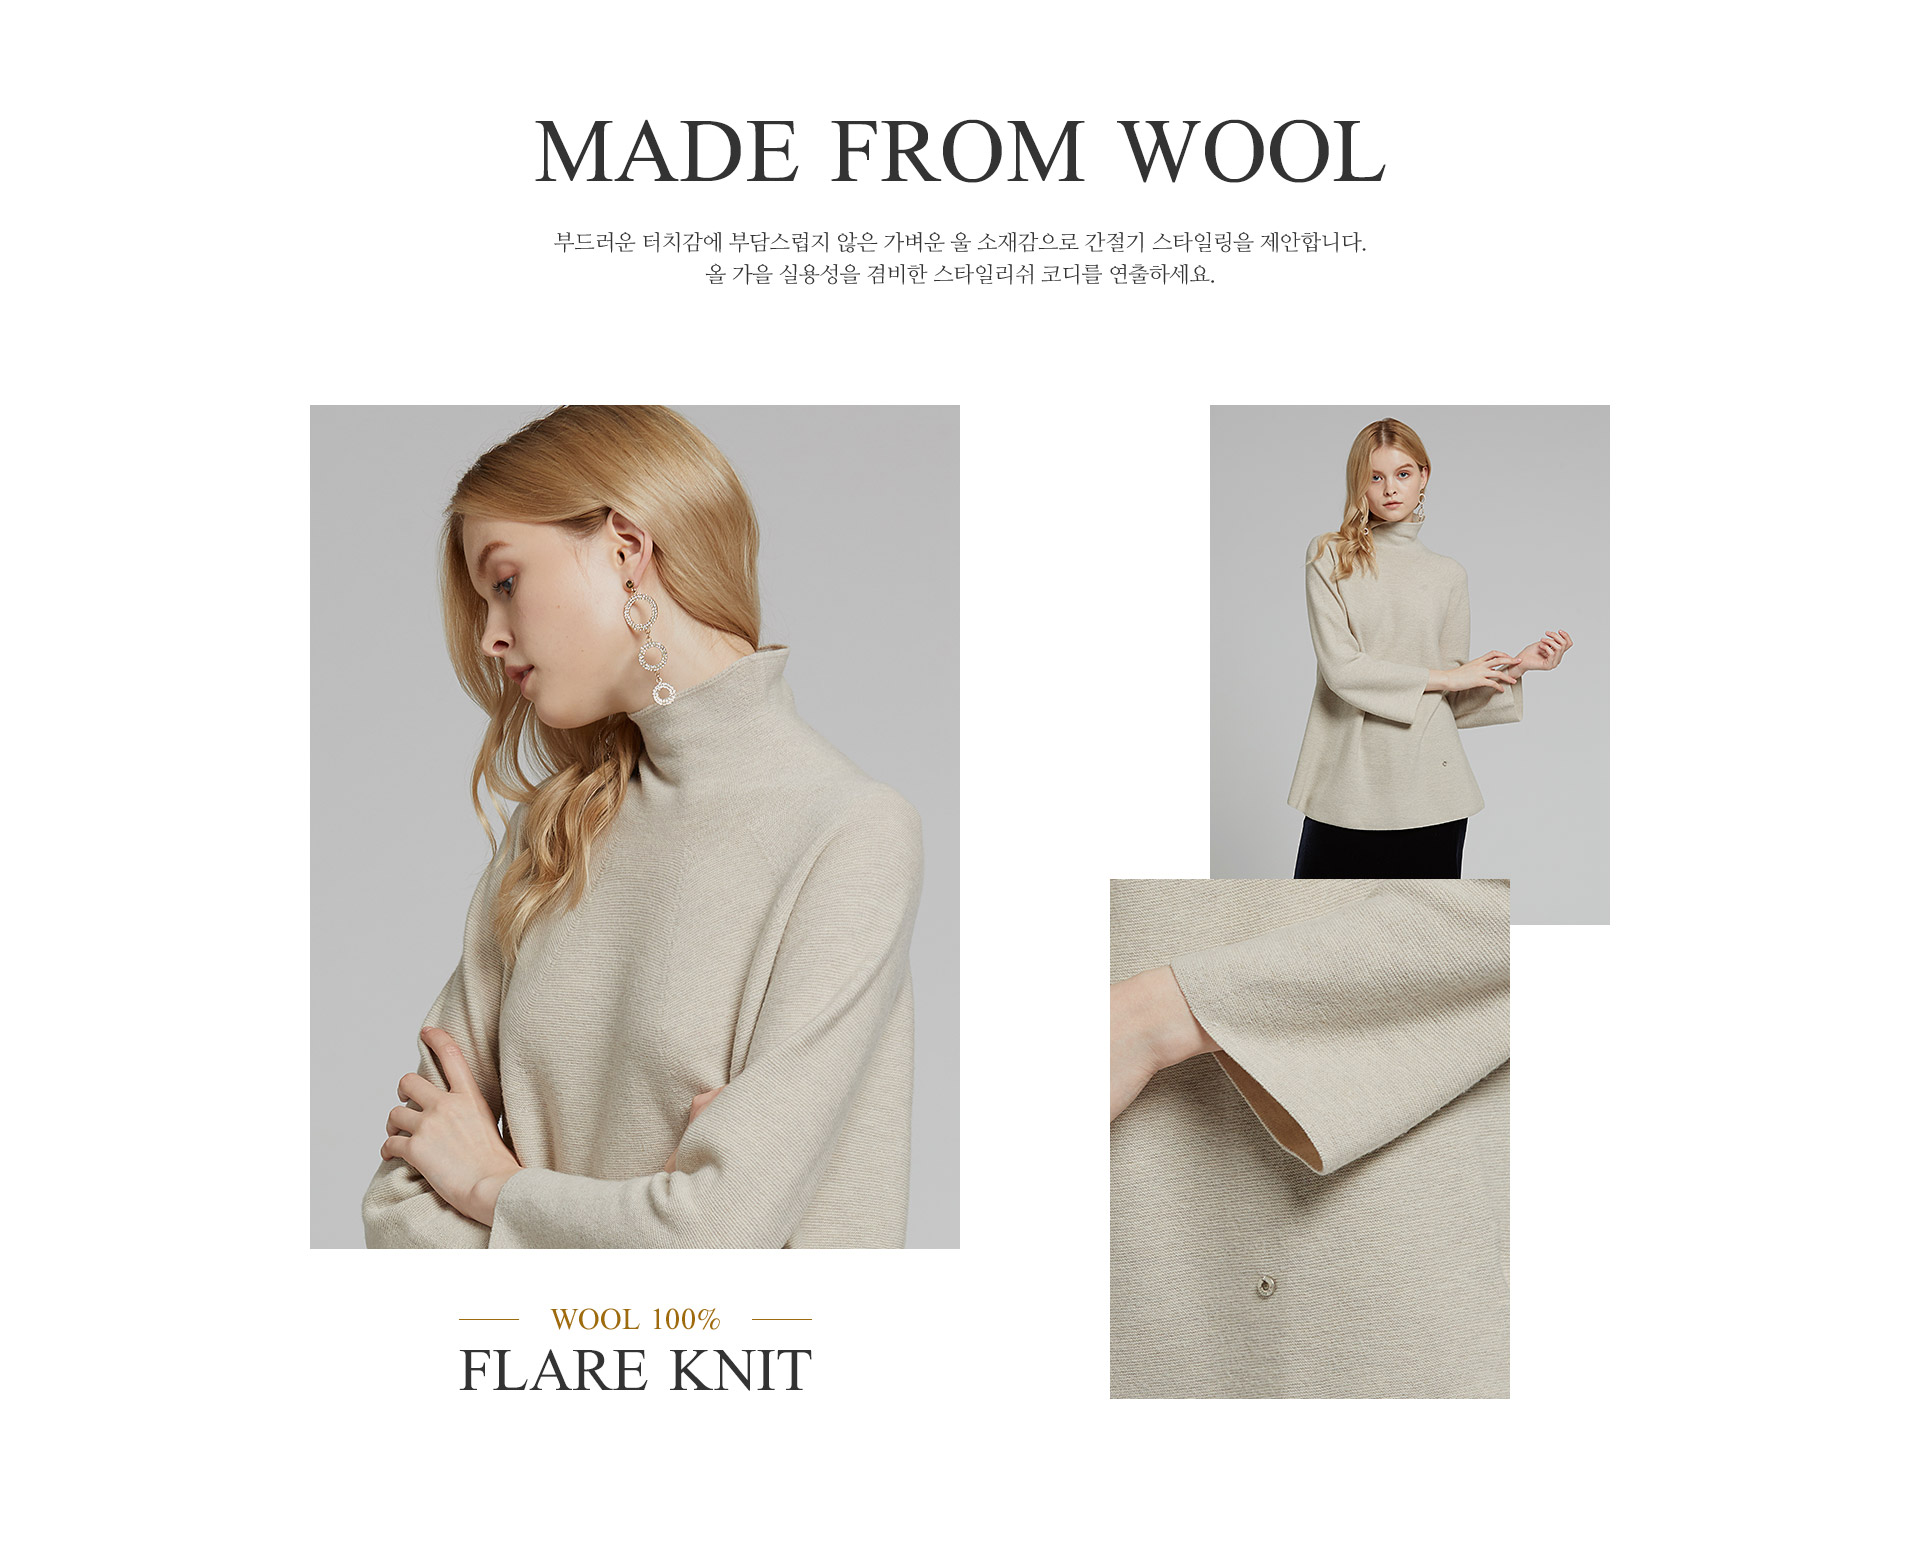 made from wool, 부드러운 터치감에 부담스럽지 않은 가벼운 울 소재감으로 간절기 스타일링을 제안 합니다. 올 가을 실용성을 겸비한 스타일리쉬 코디연출하세요.,wool 100%